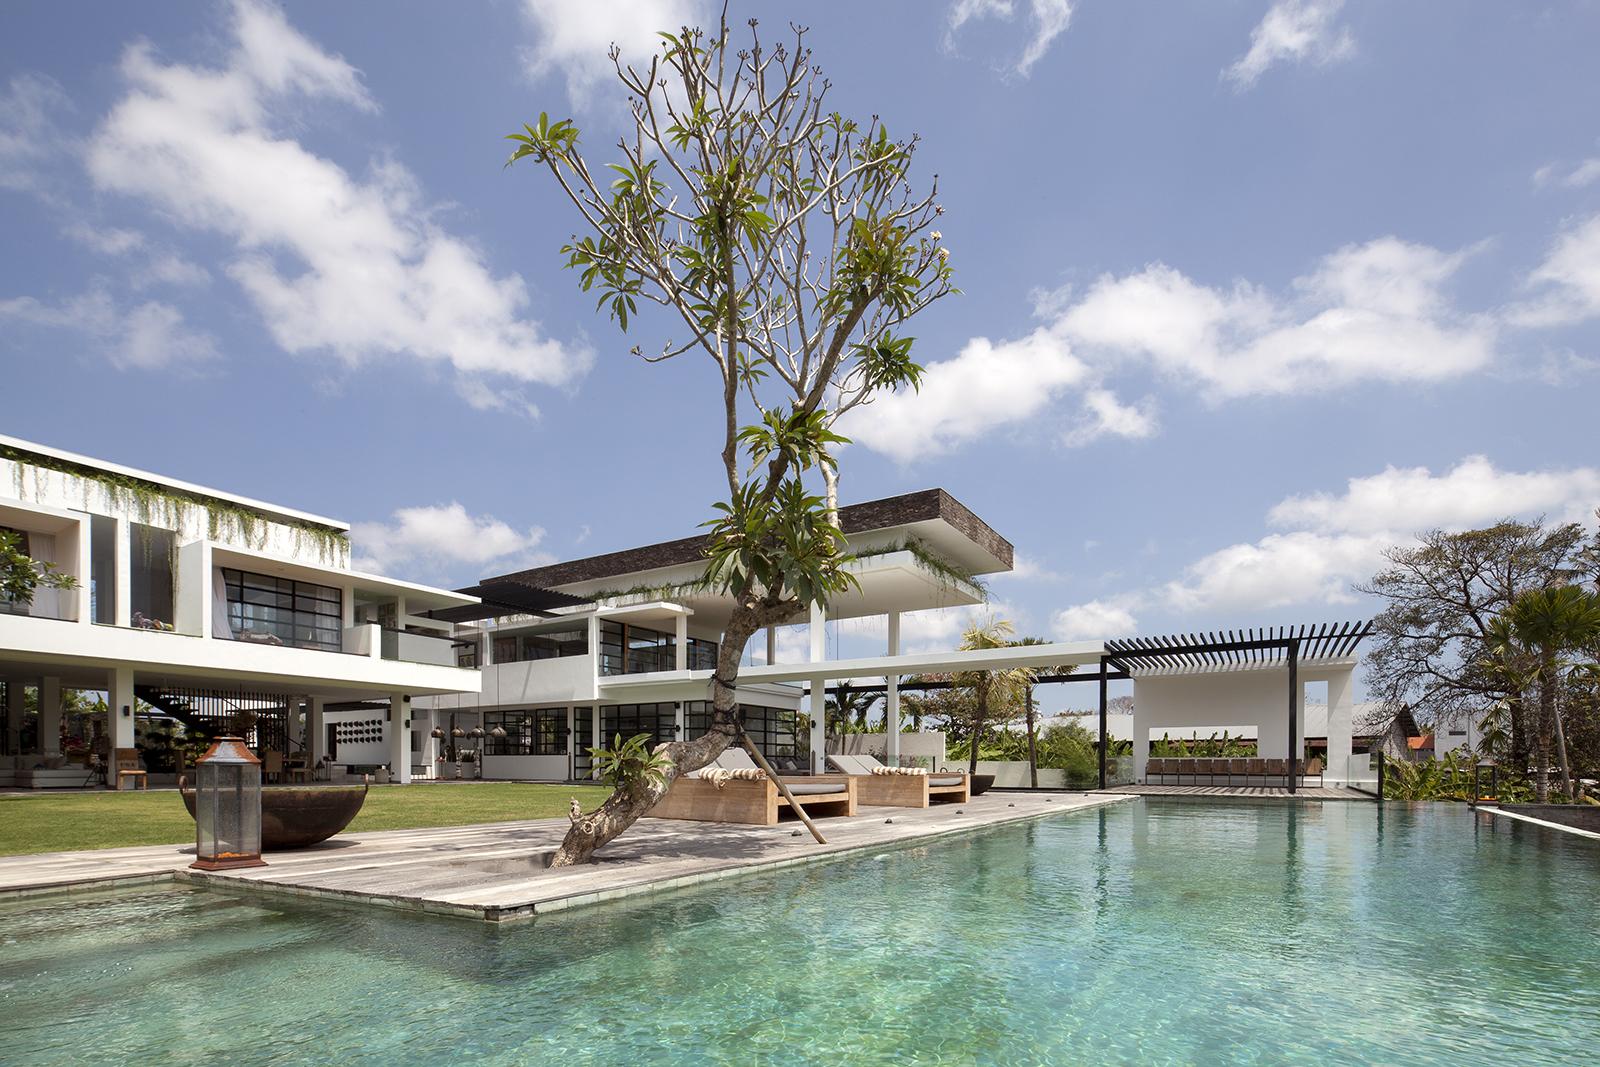 Villa suami pool view canggu bali